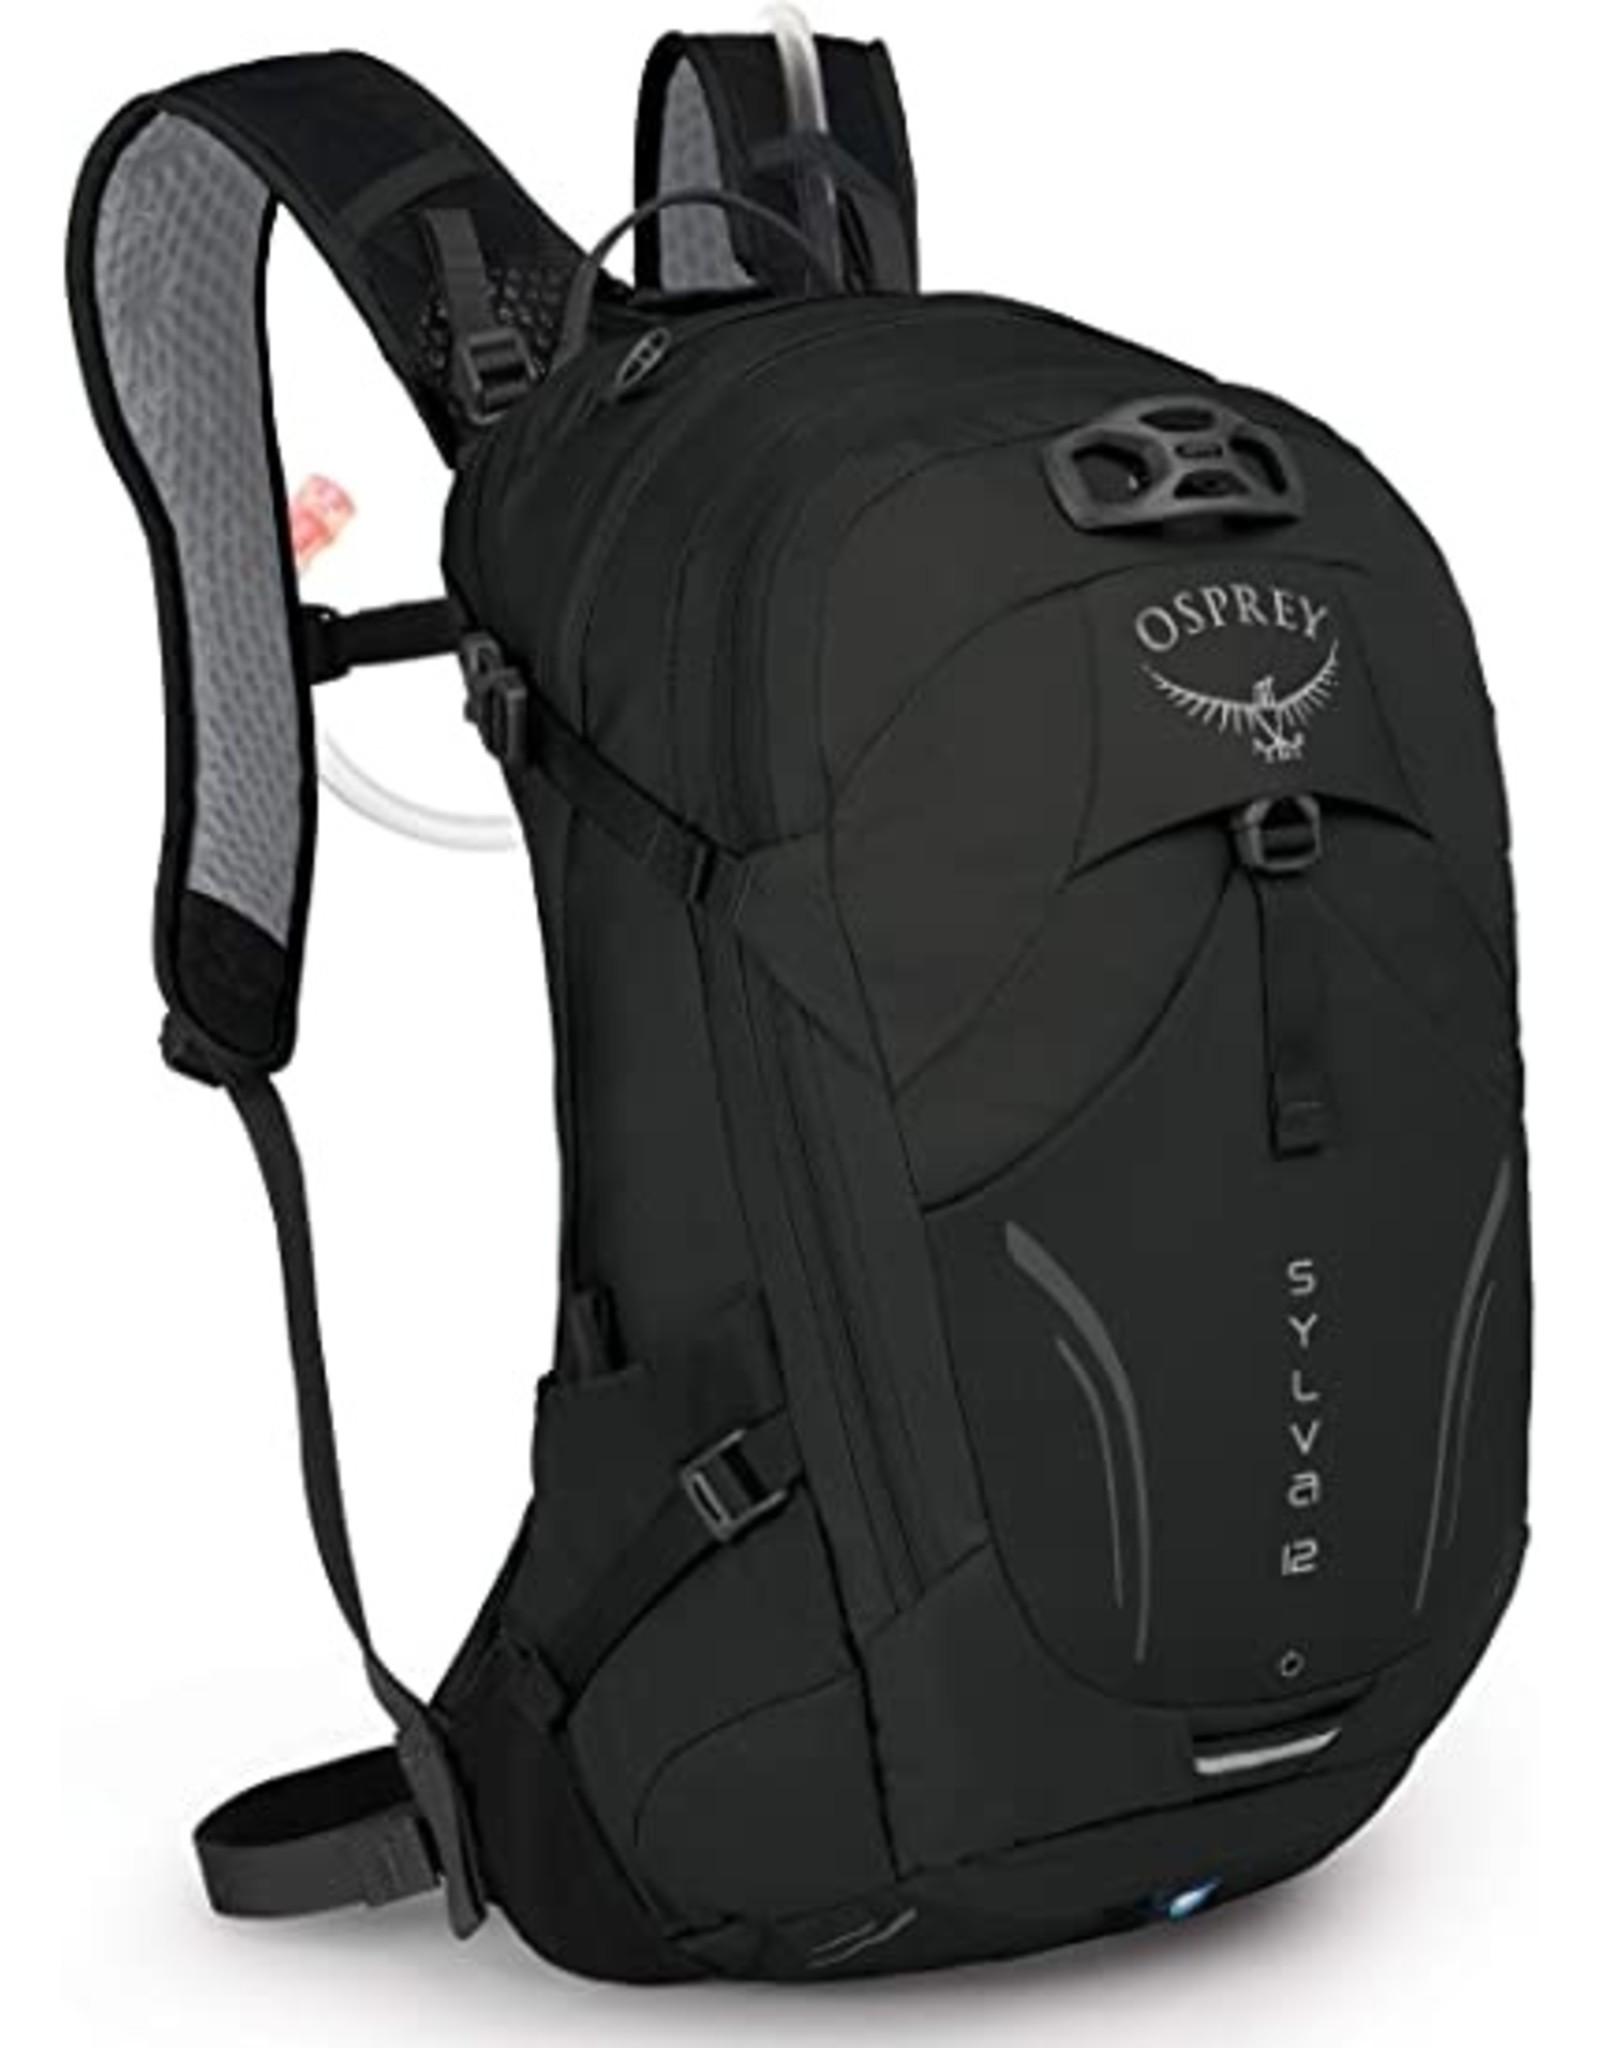 Osprey Osprey Sylva 12 Women's Hydration Pack: Black